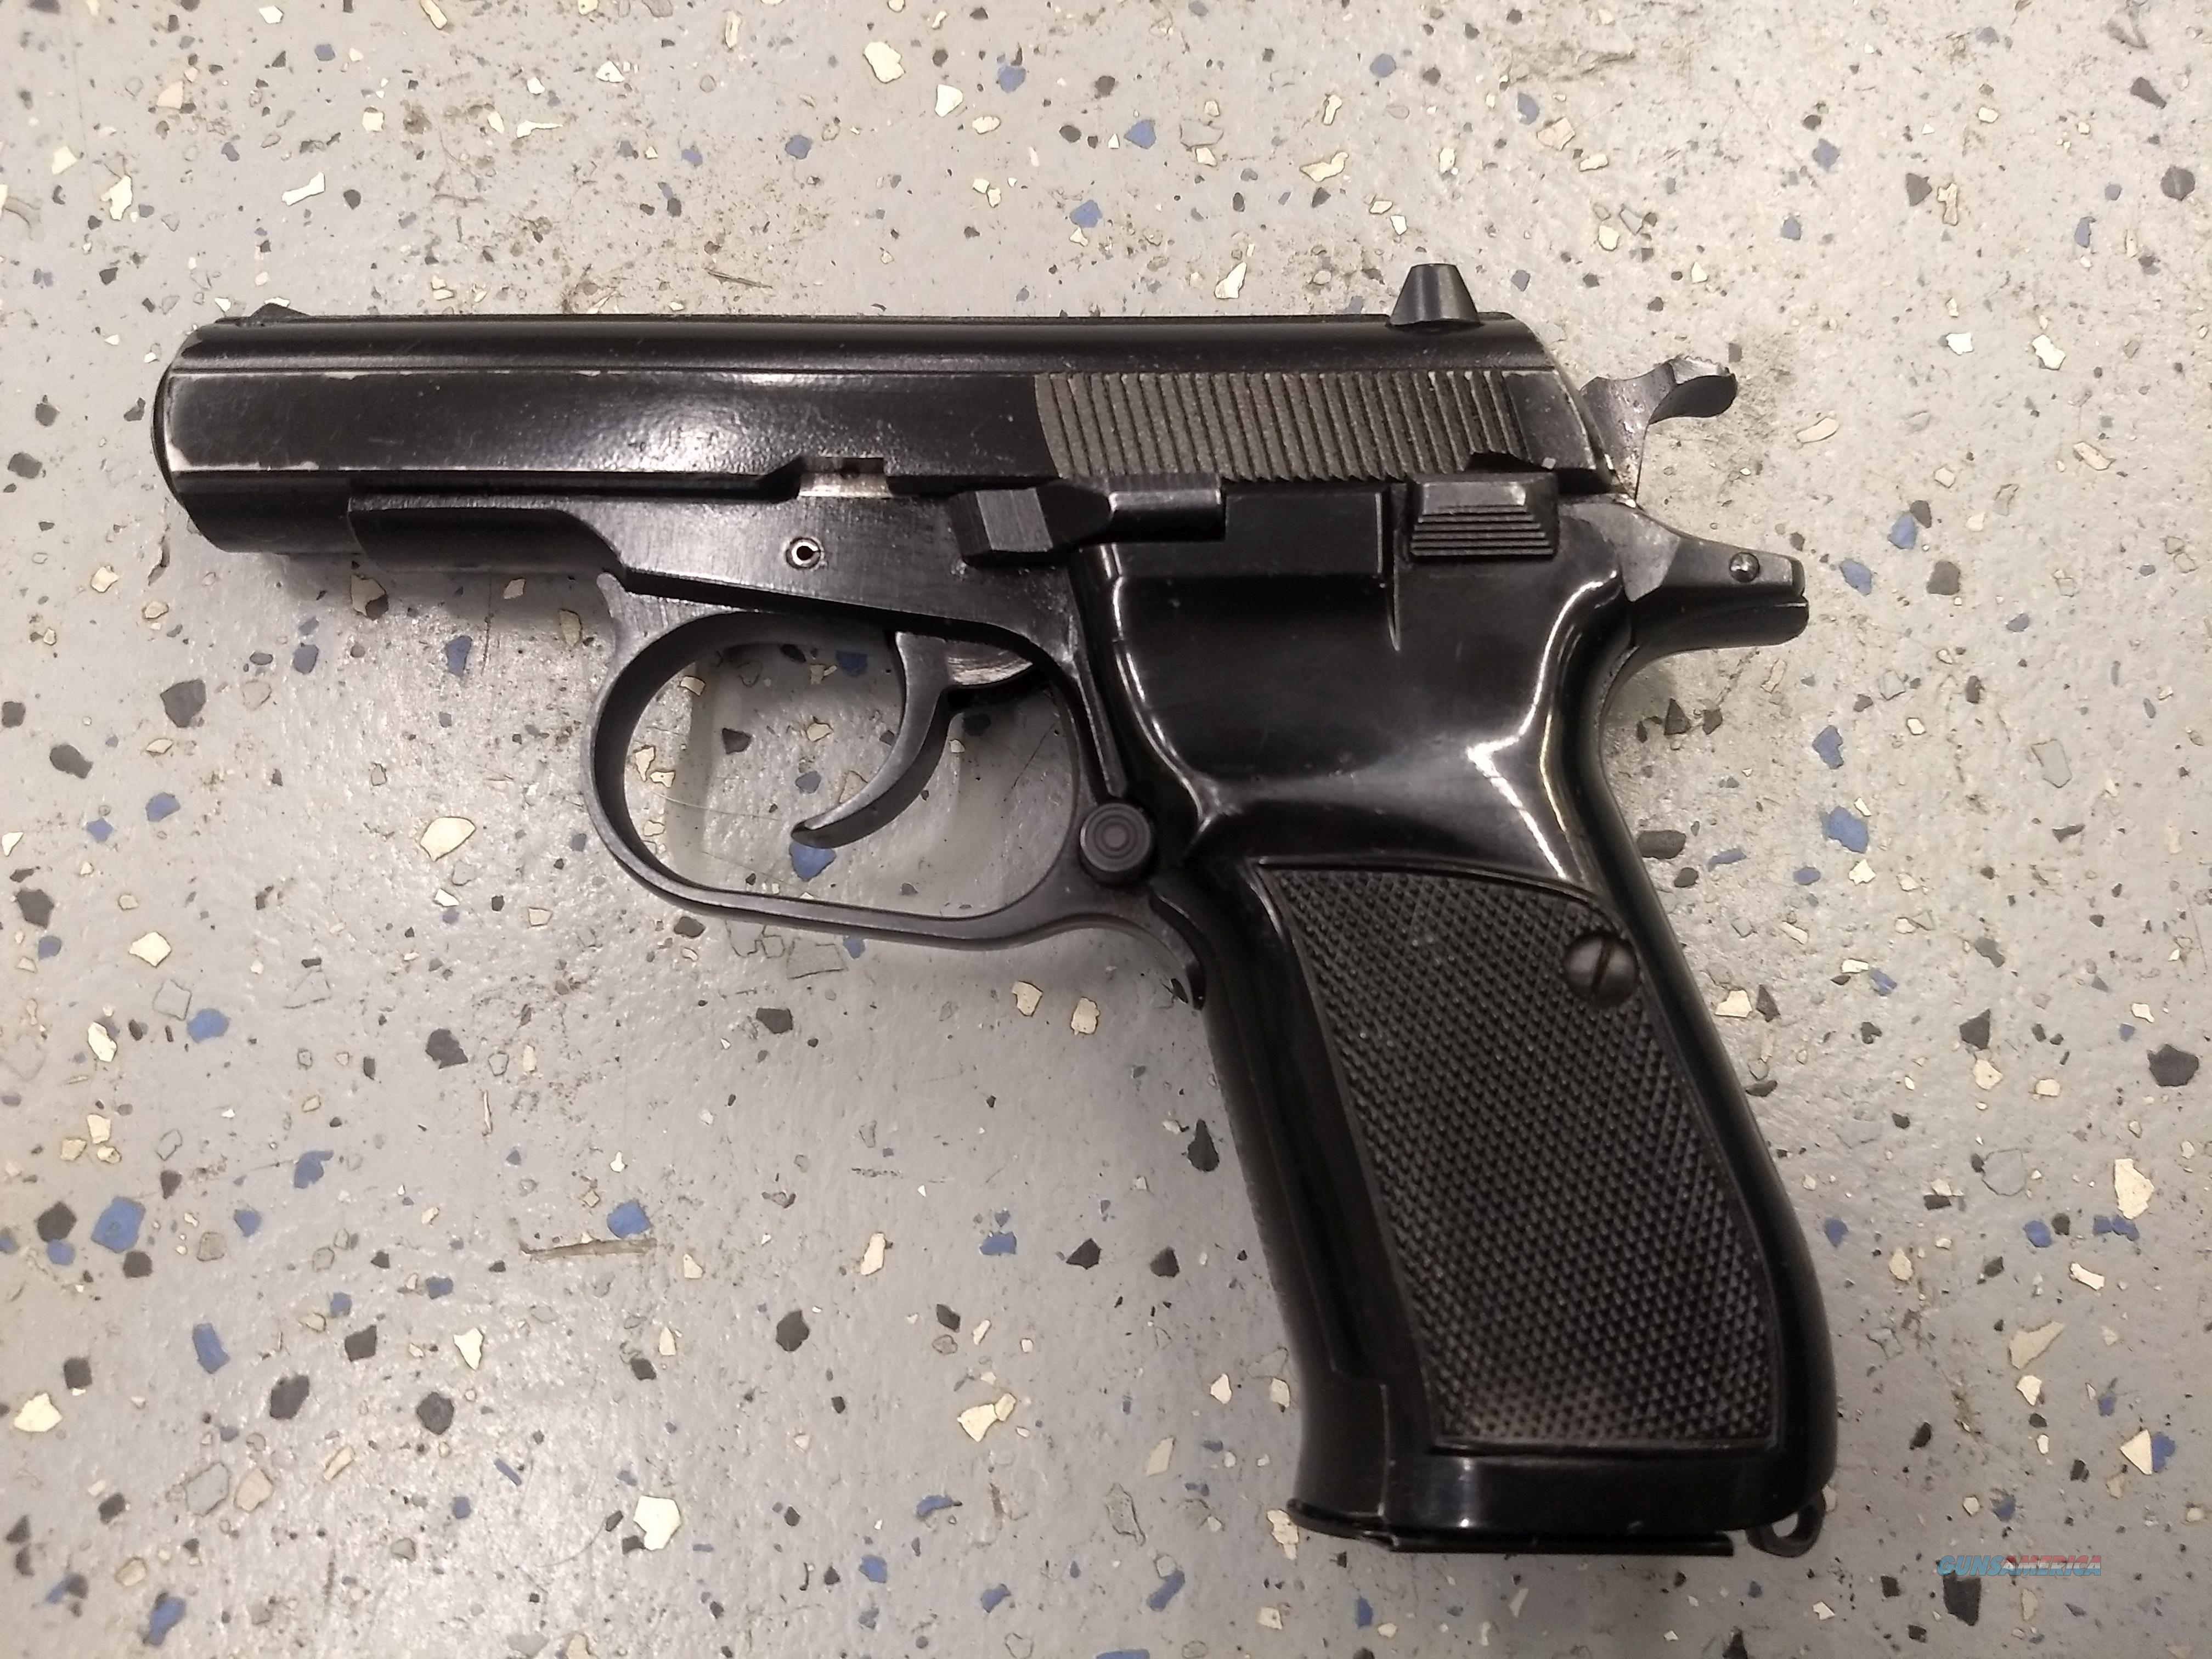 CZ-82 9x18 mm Makarov Surplus   Guns > Pistols > CZ Pistols